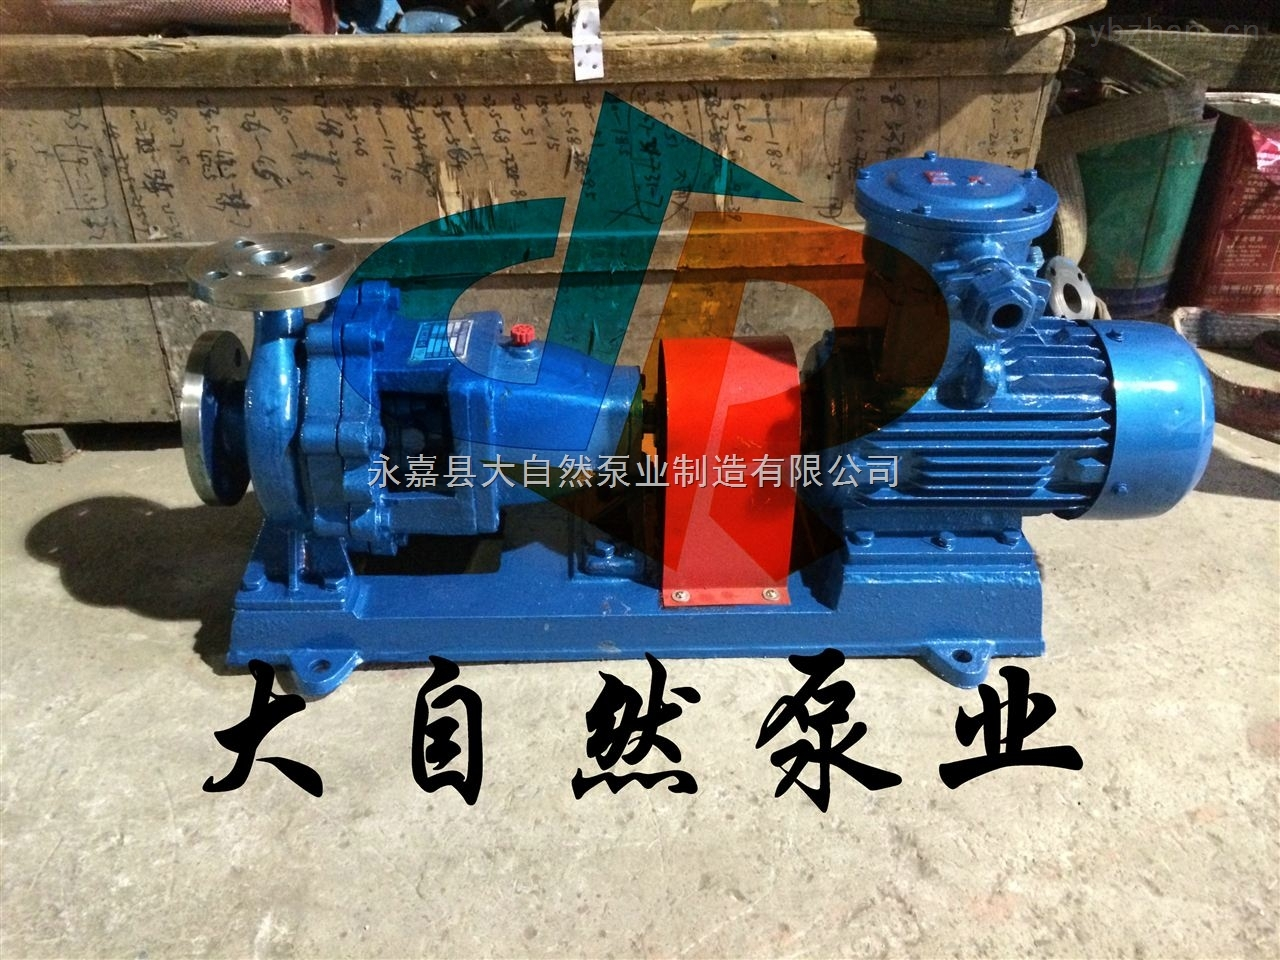 IH100-80-160-供应IH100-80-160不锈钢化工泵